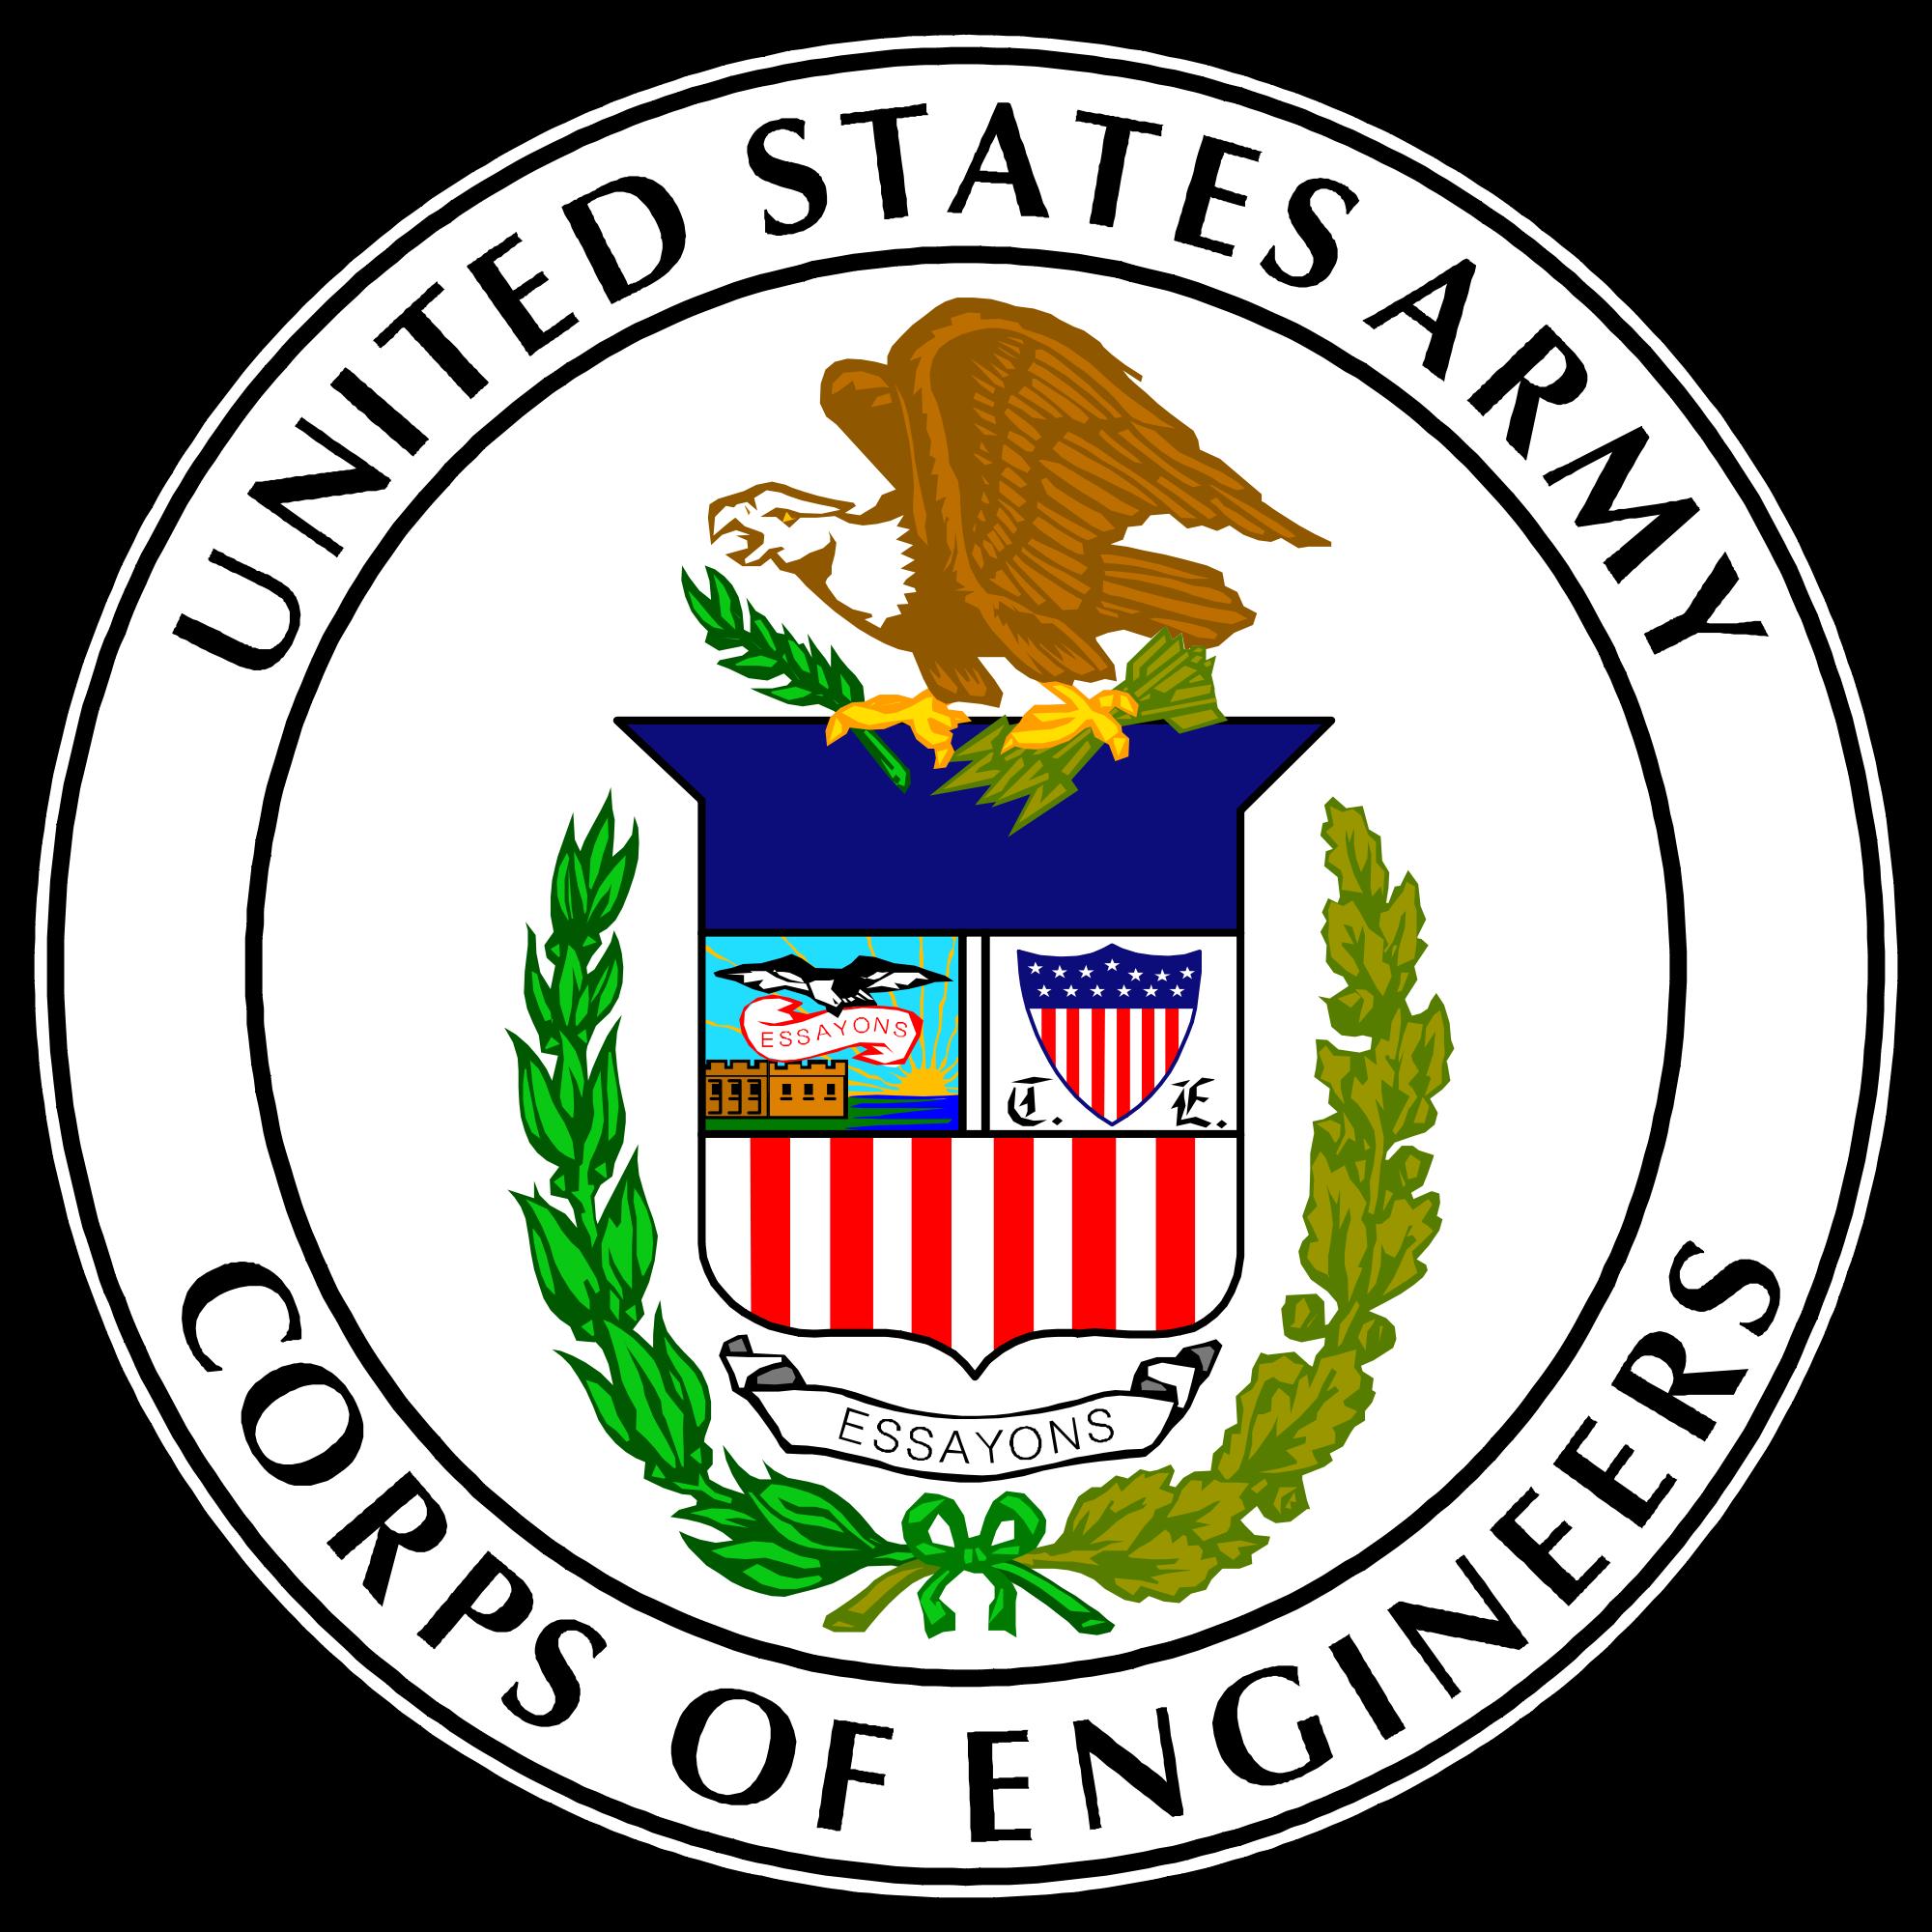 US-ArmyCorpsOfEngineers-Seal